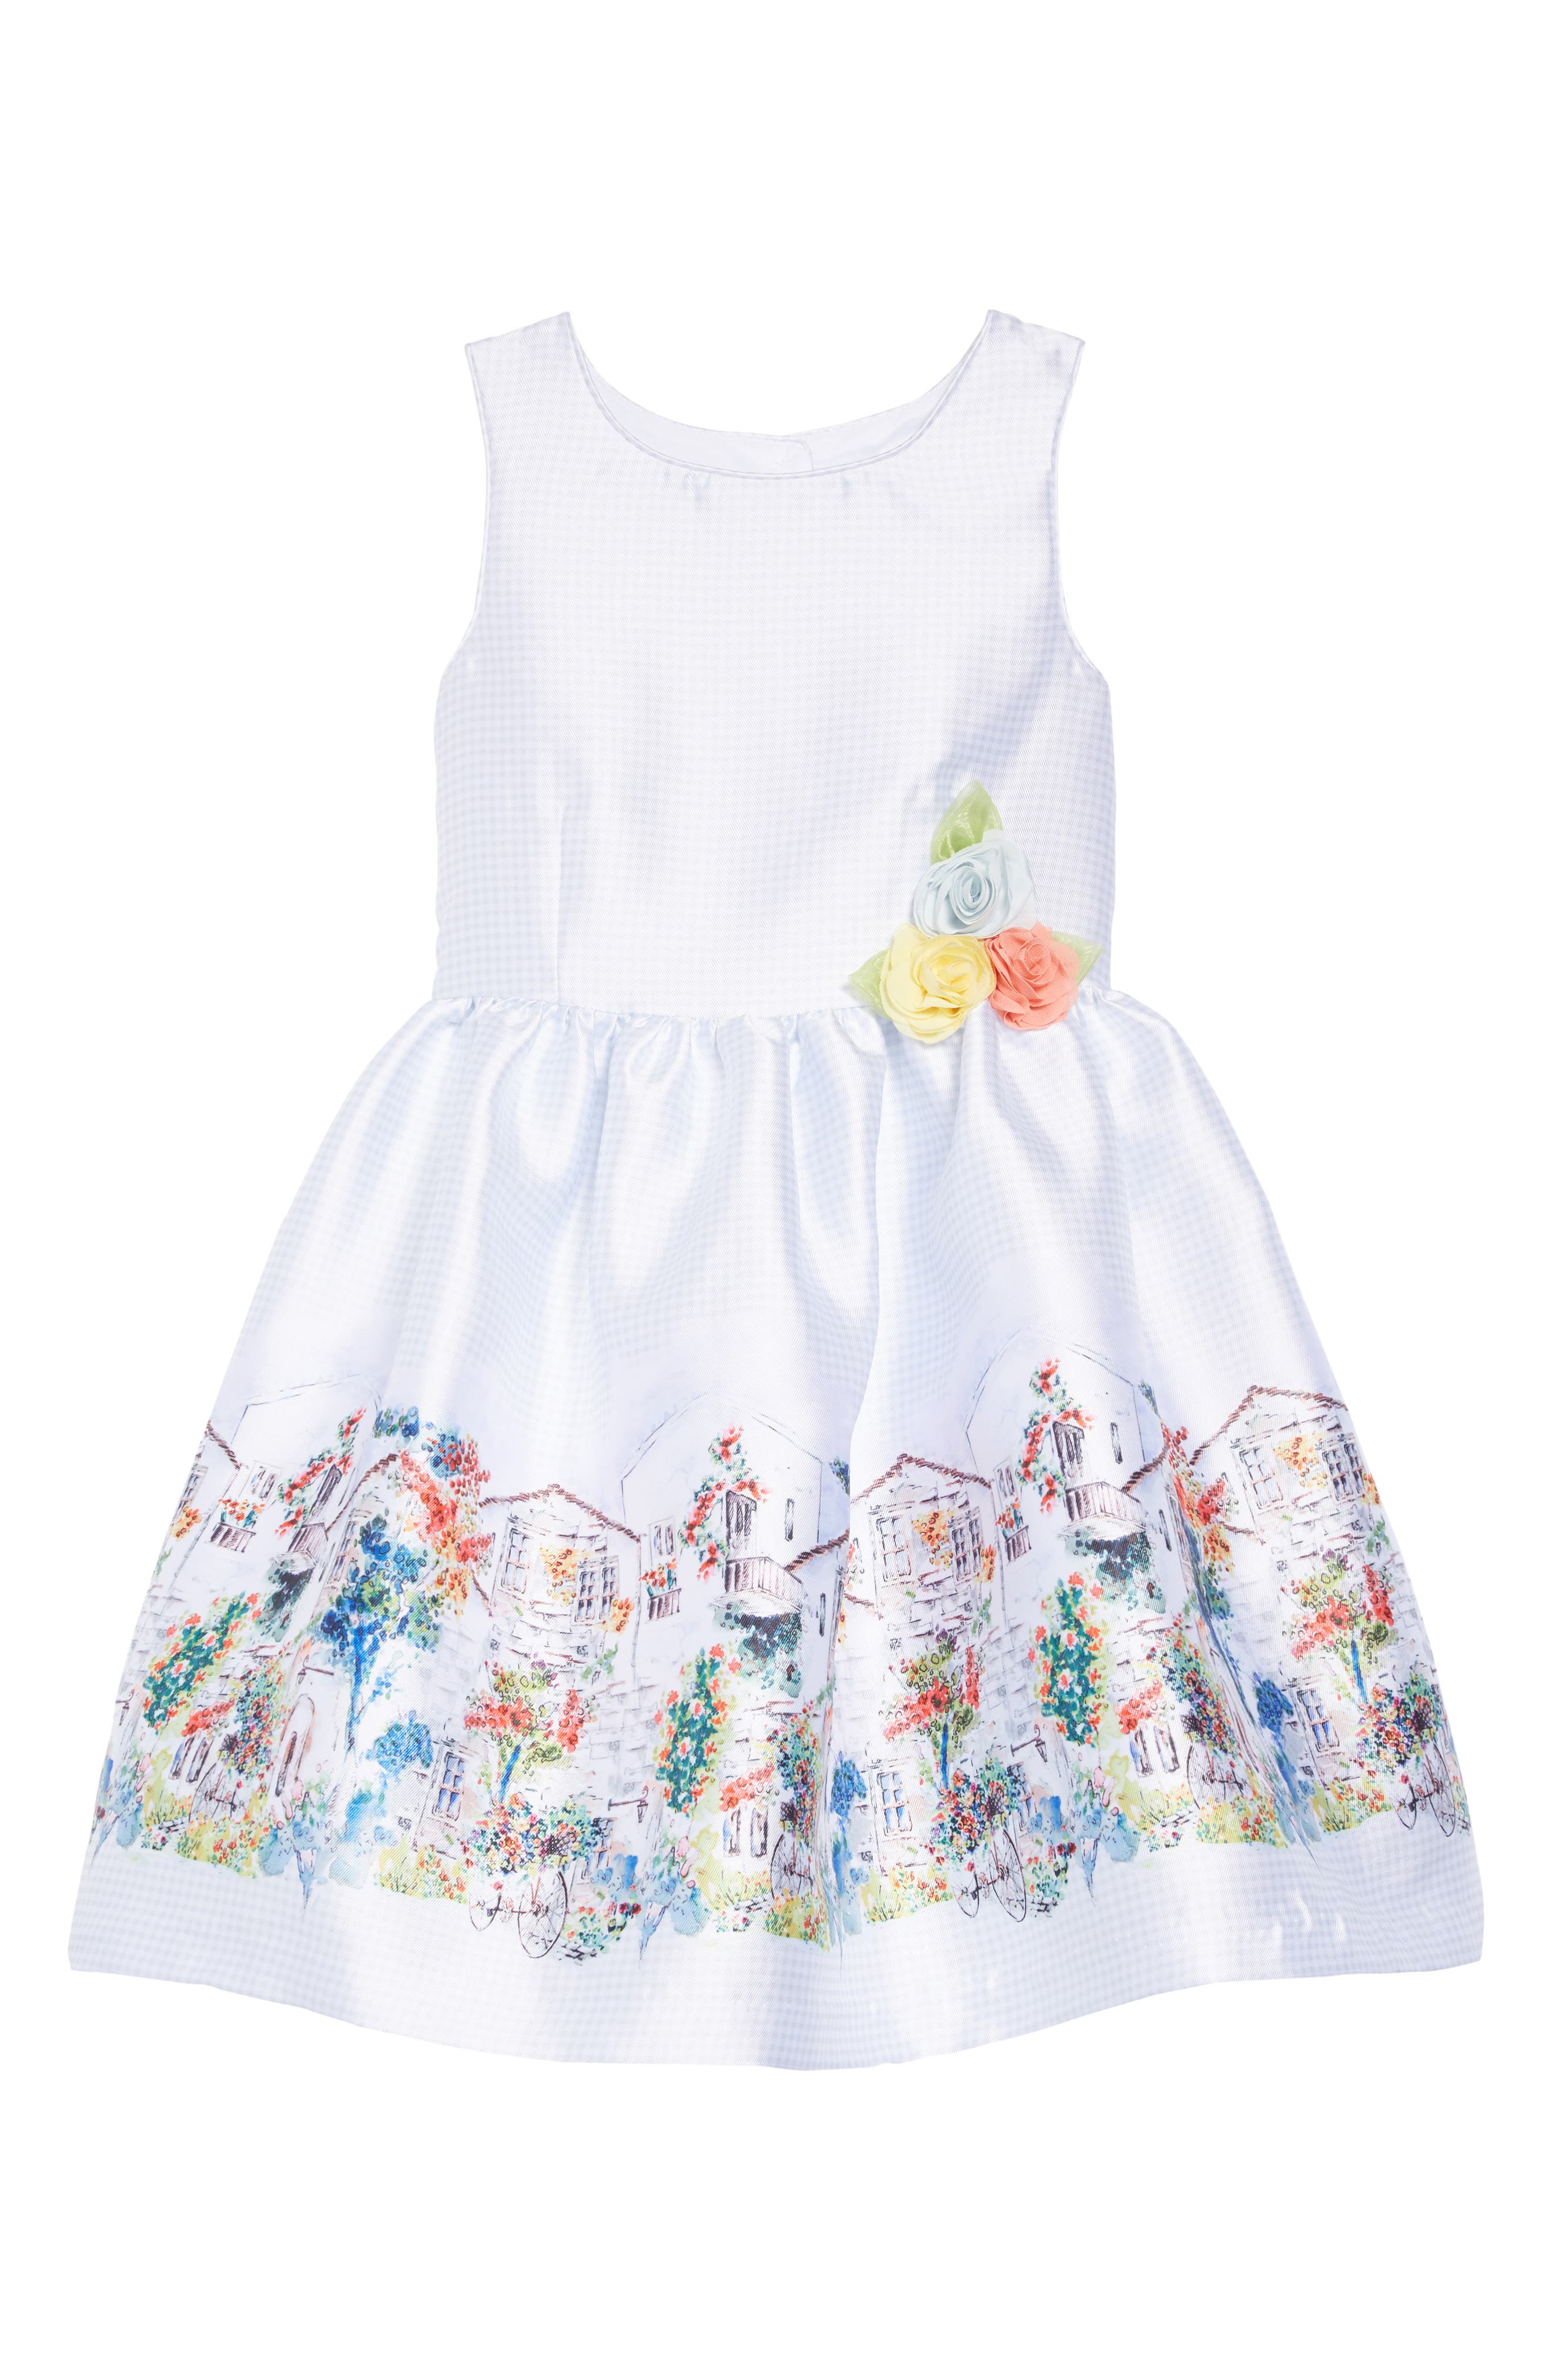 PIPPA & JULIE, Border Print Gingham Dress, Main thumbnail 1, color, GREY/ WHITE